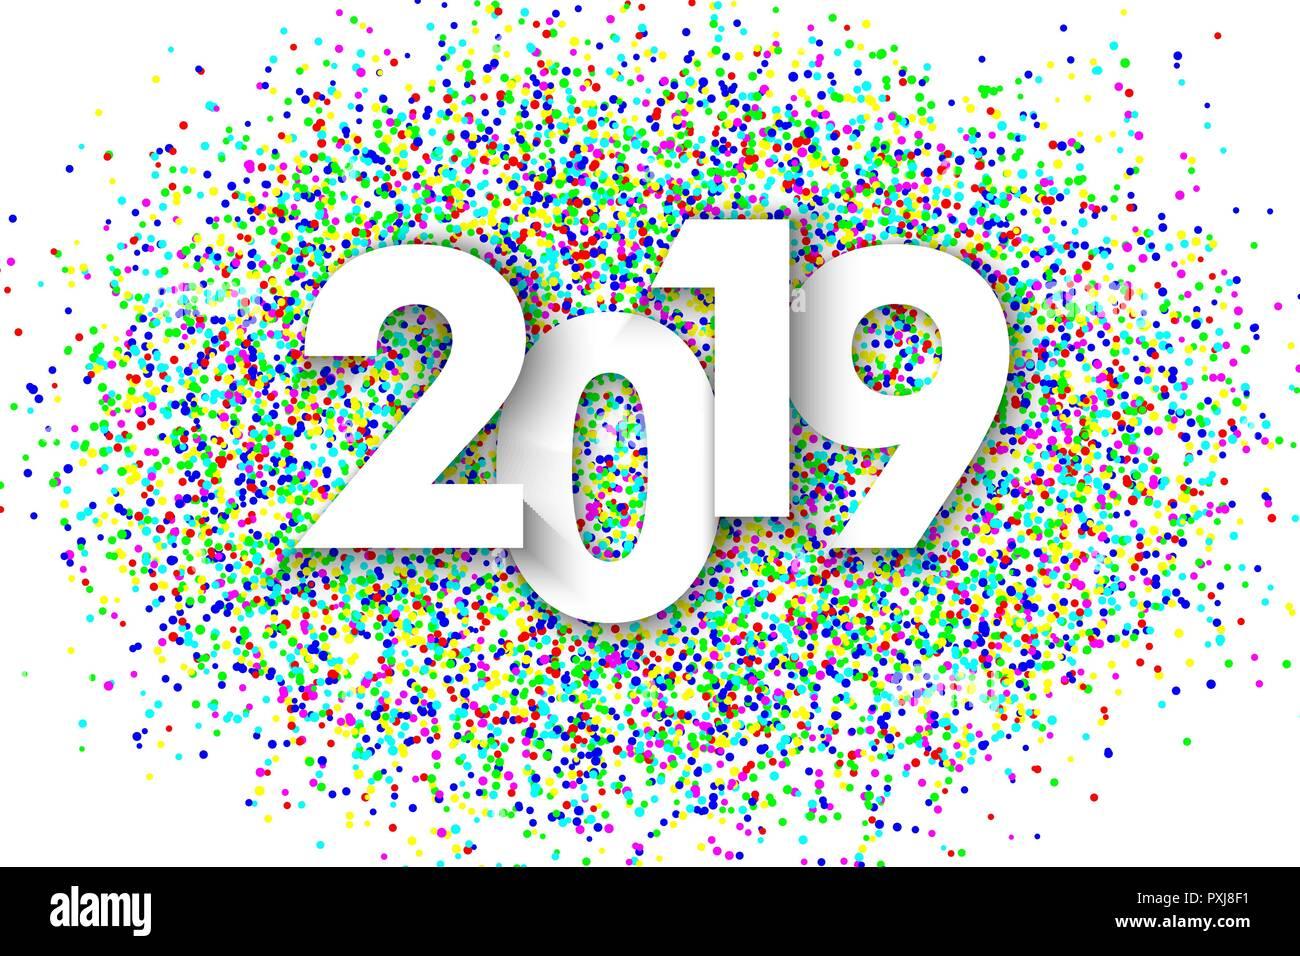 2019 new year background with colorfull glitter confetti  festive premium design template for